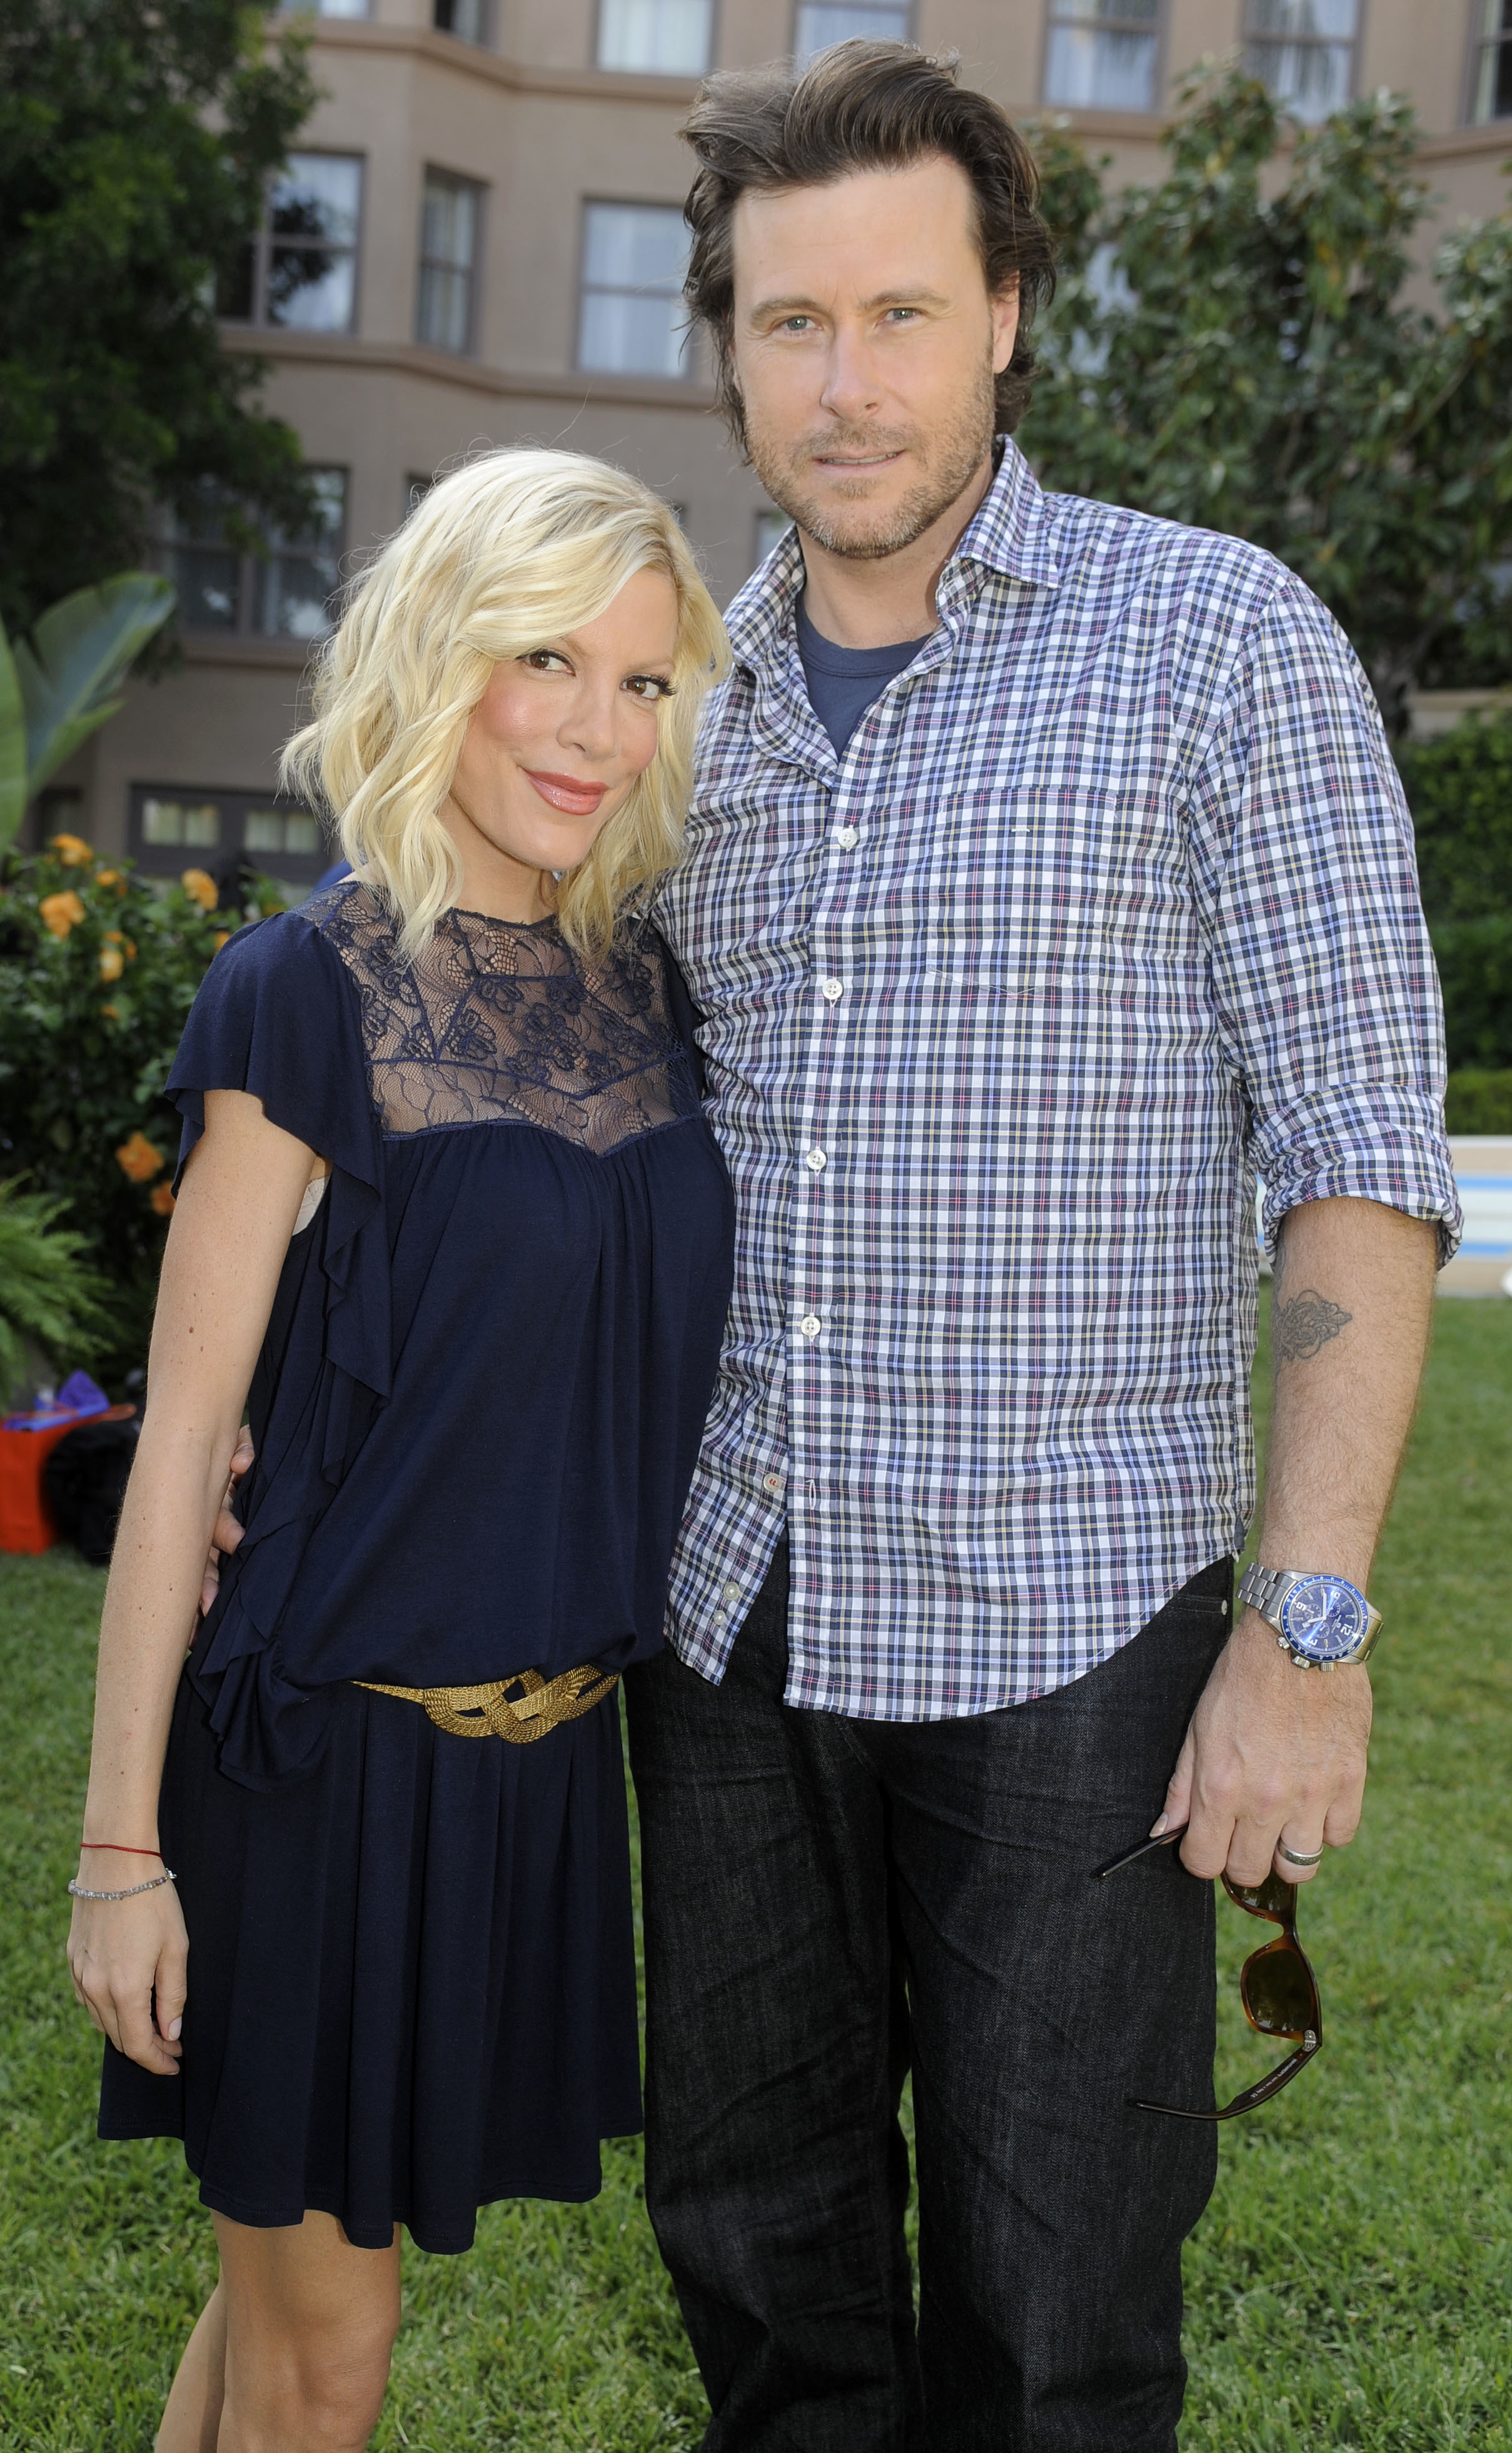 Tori and Dean